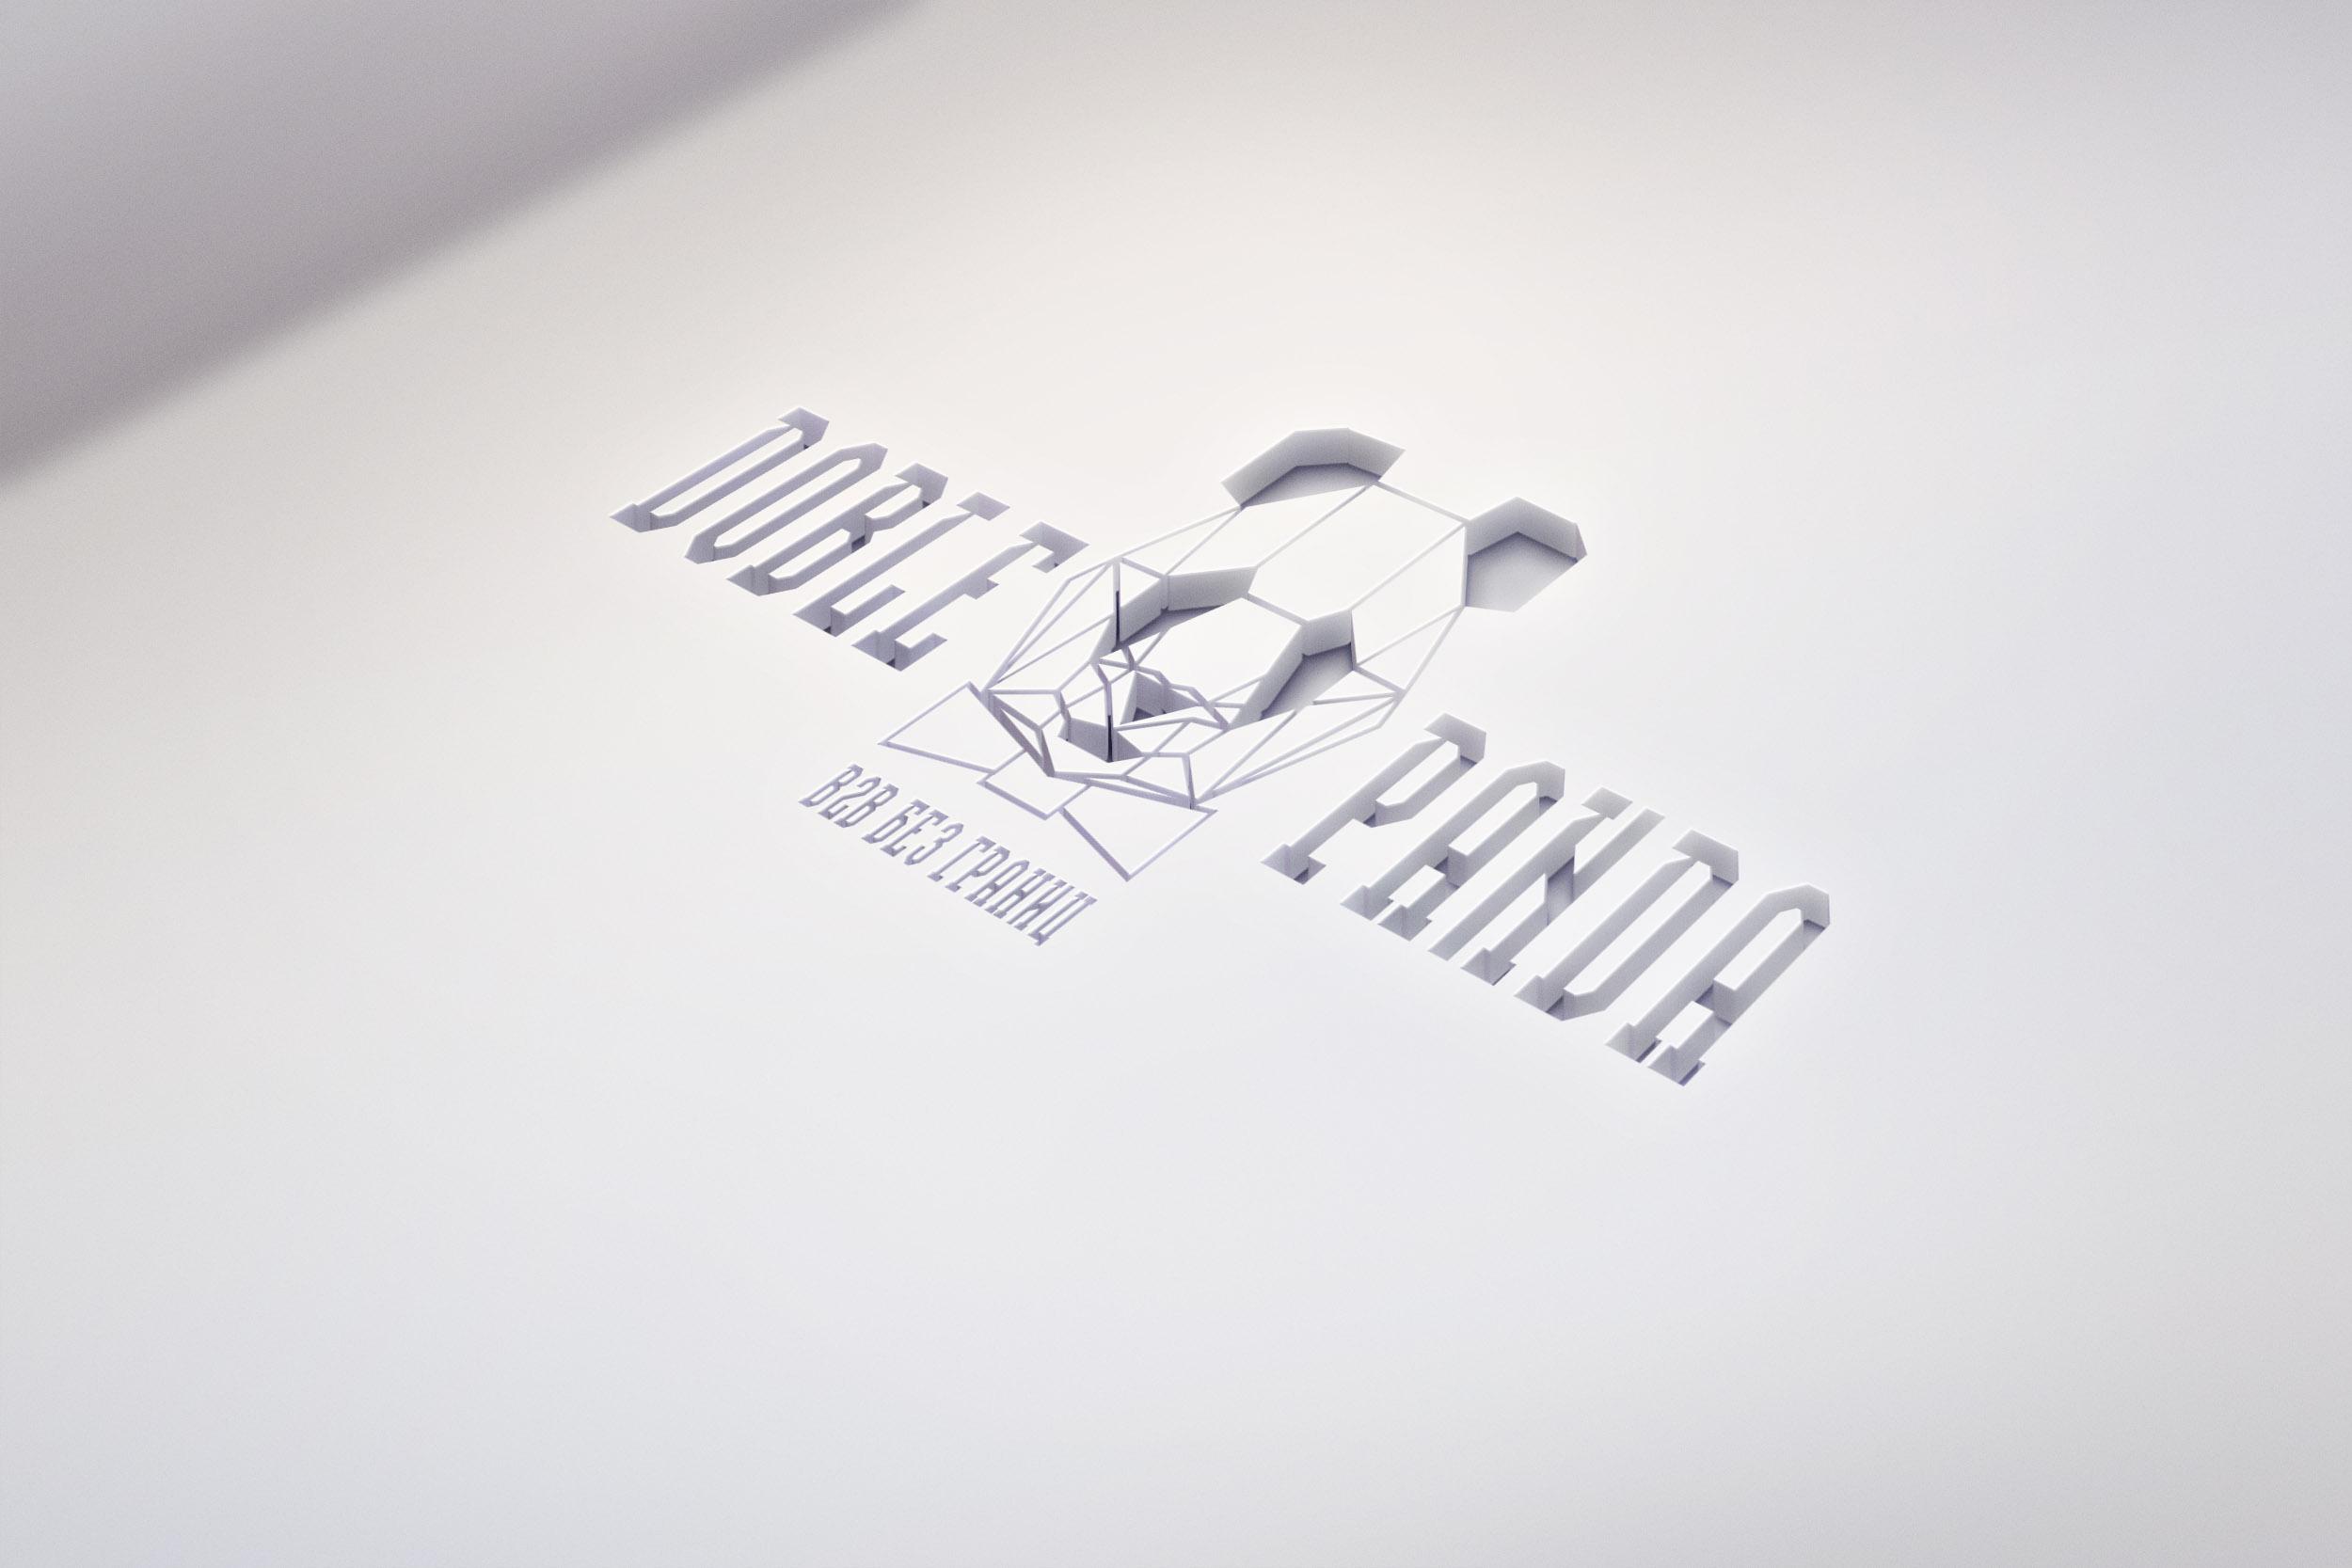 Логотип ----------------------------- фото f_0915970b400474a7.jpg